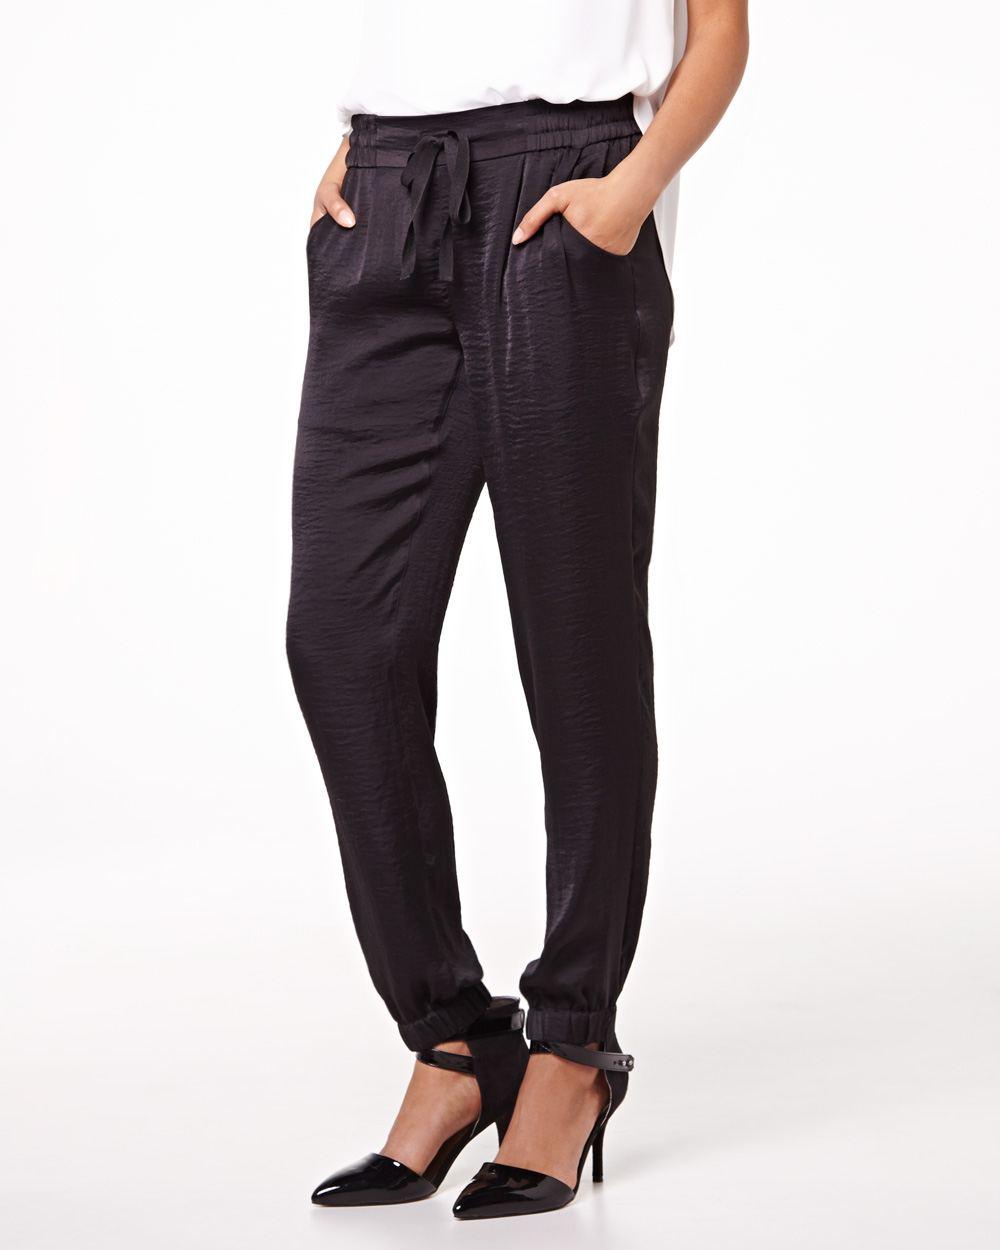 pantalon fluide taille lastique rw co. Black Bedroom Furniture Sets. Home Design Ideas